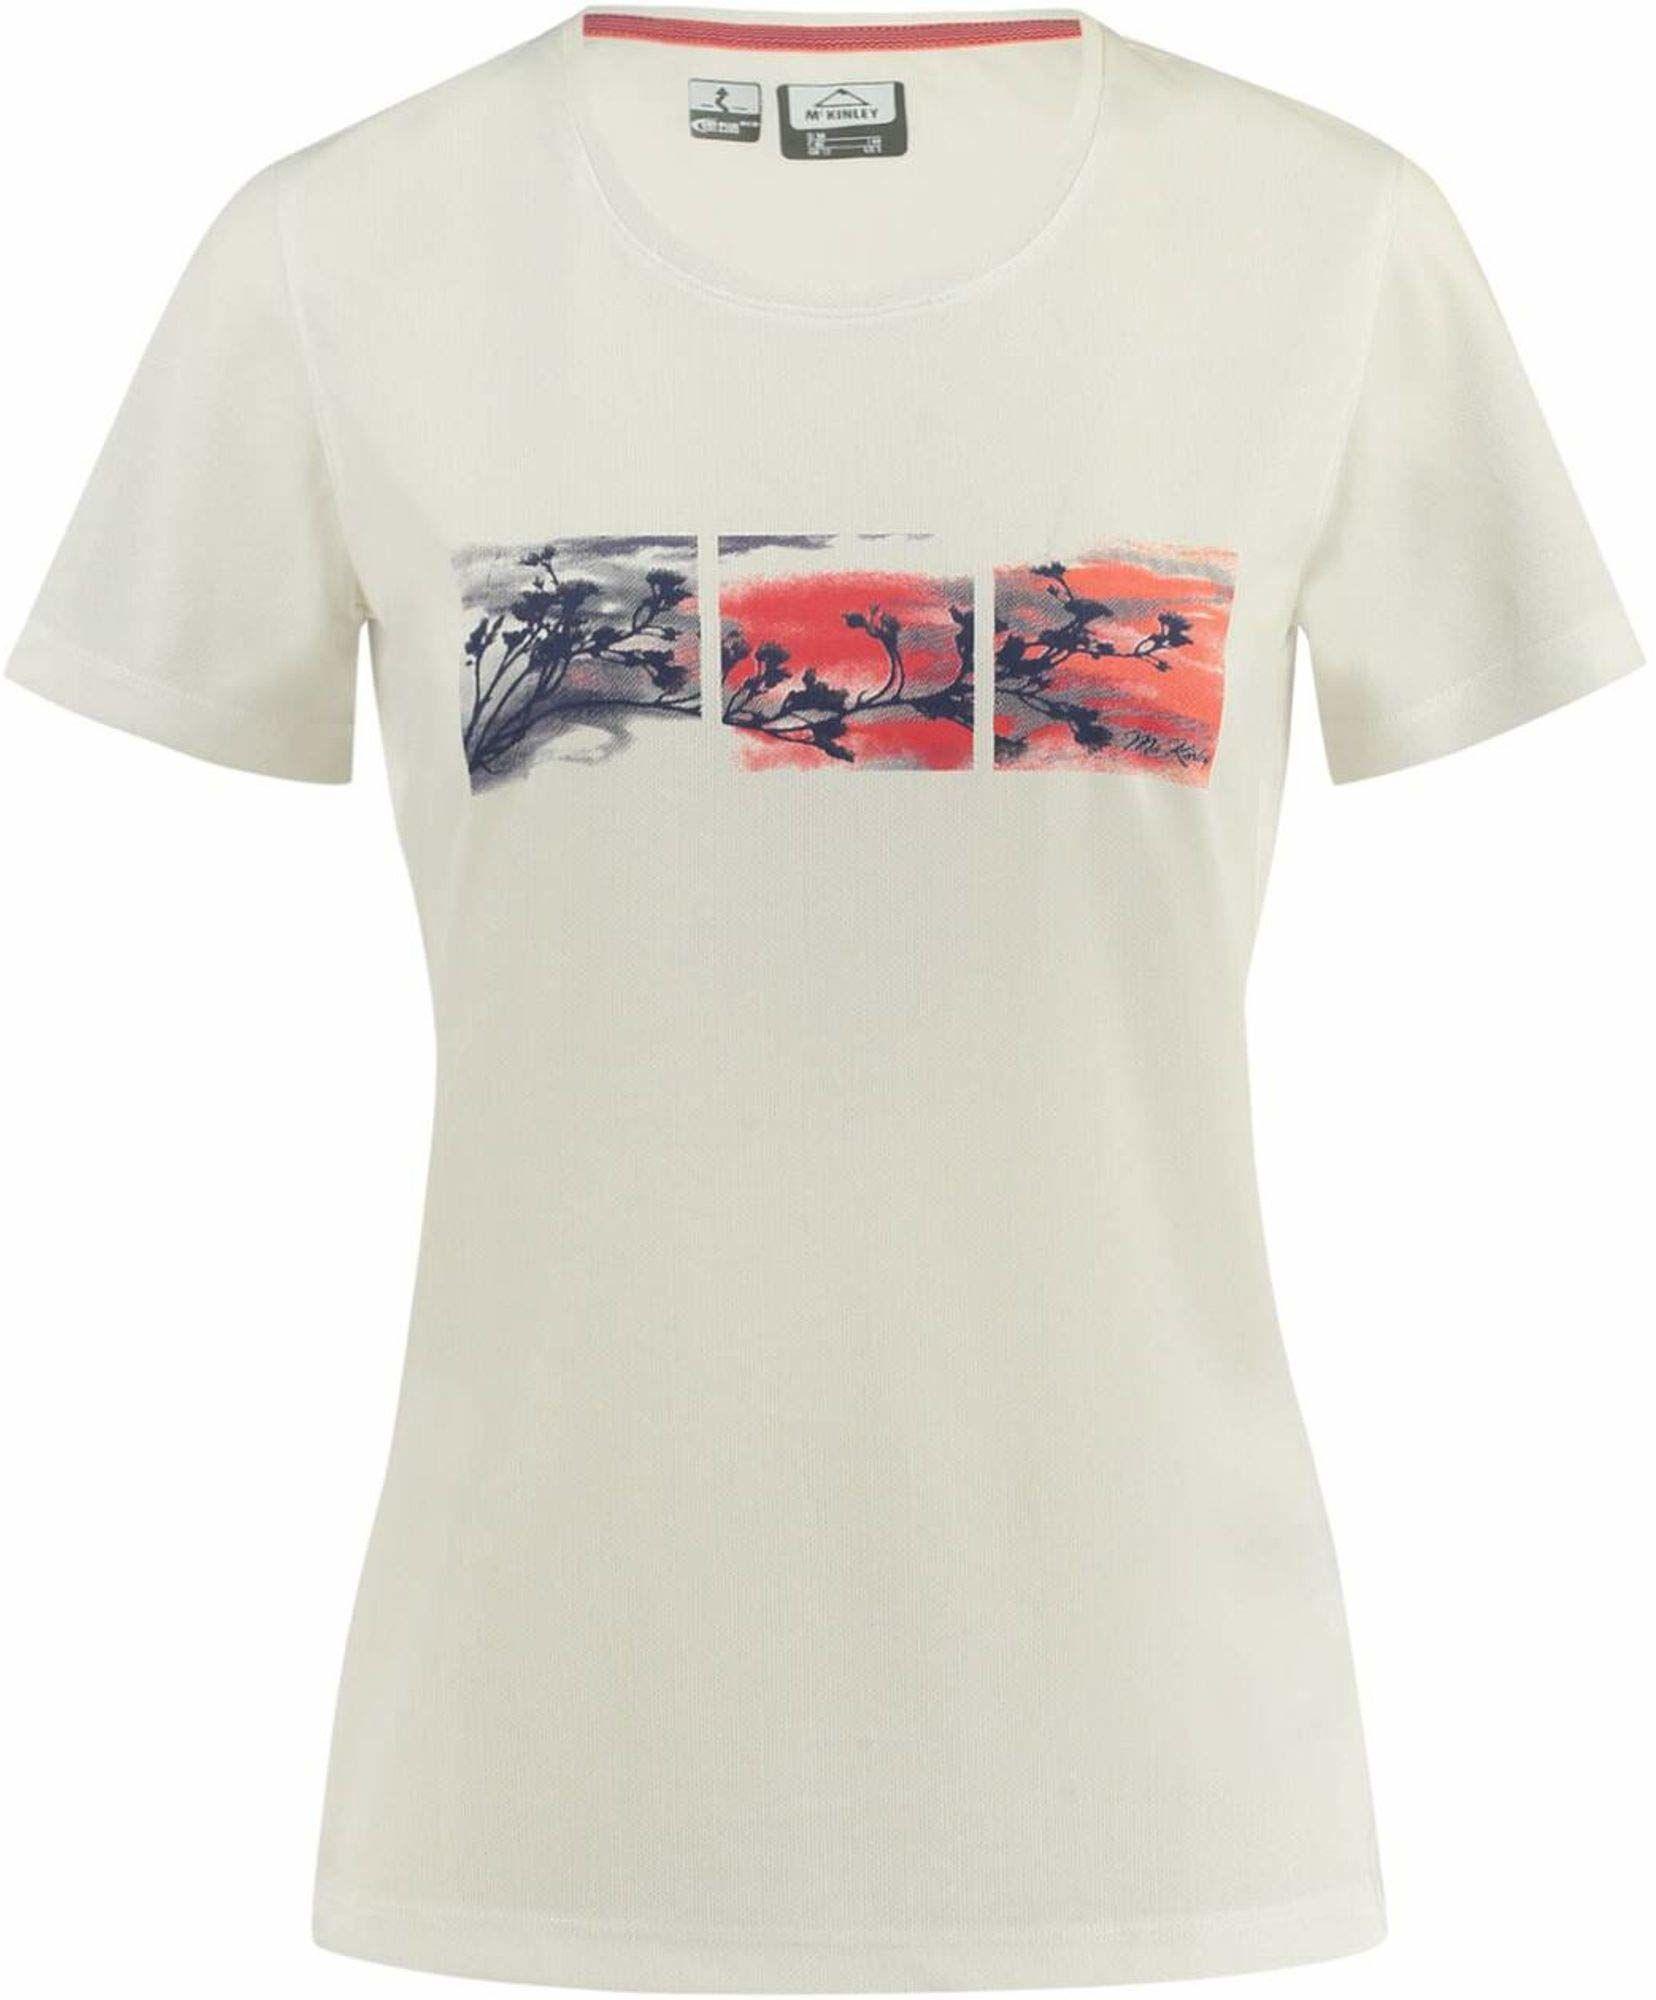 McKINLEY Damski T-shirt Jaffa, biały, 44